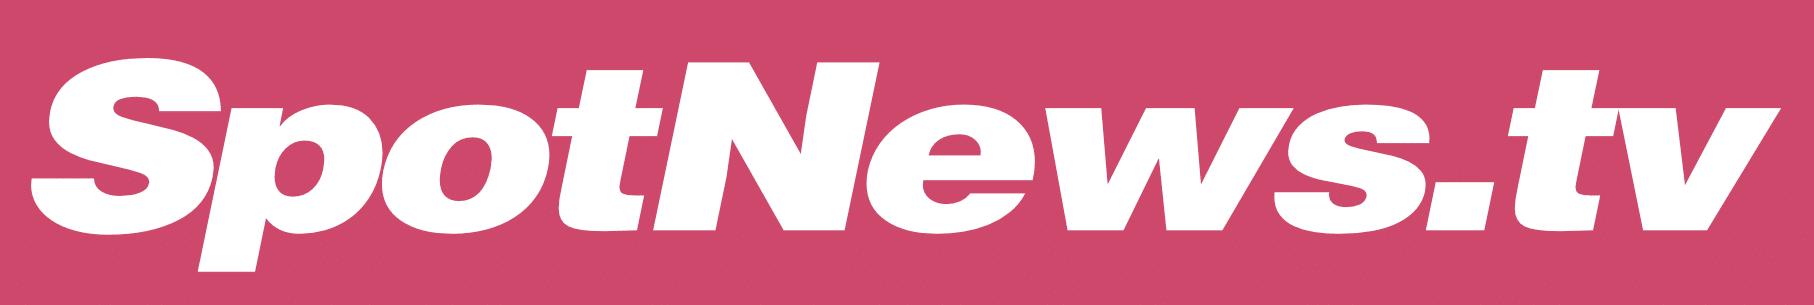 SpotNews.tv